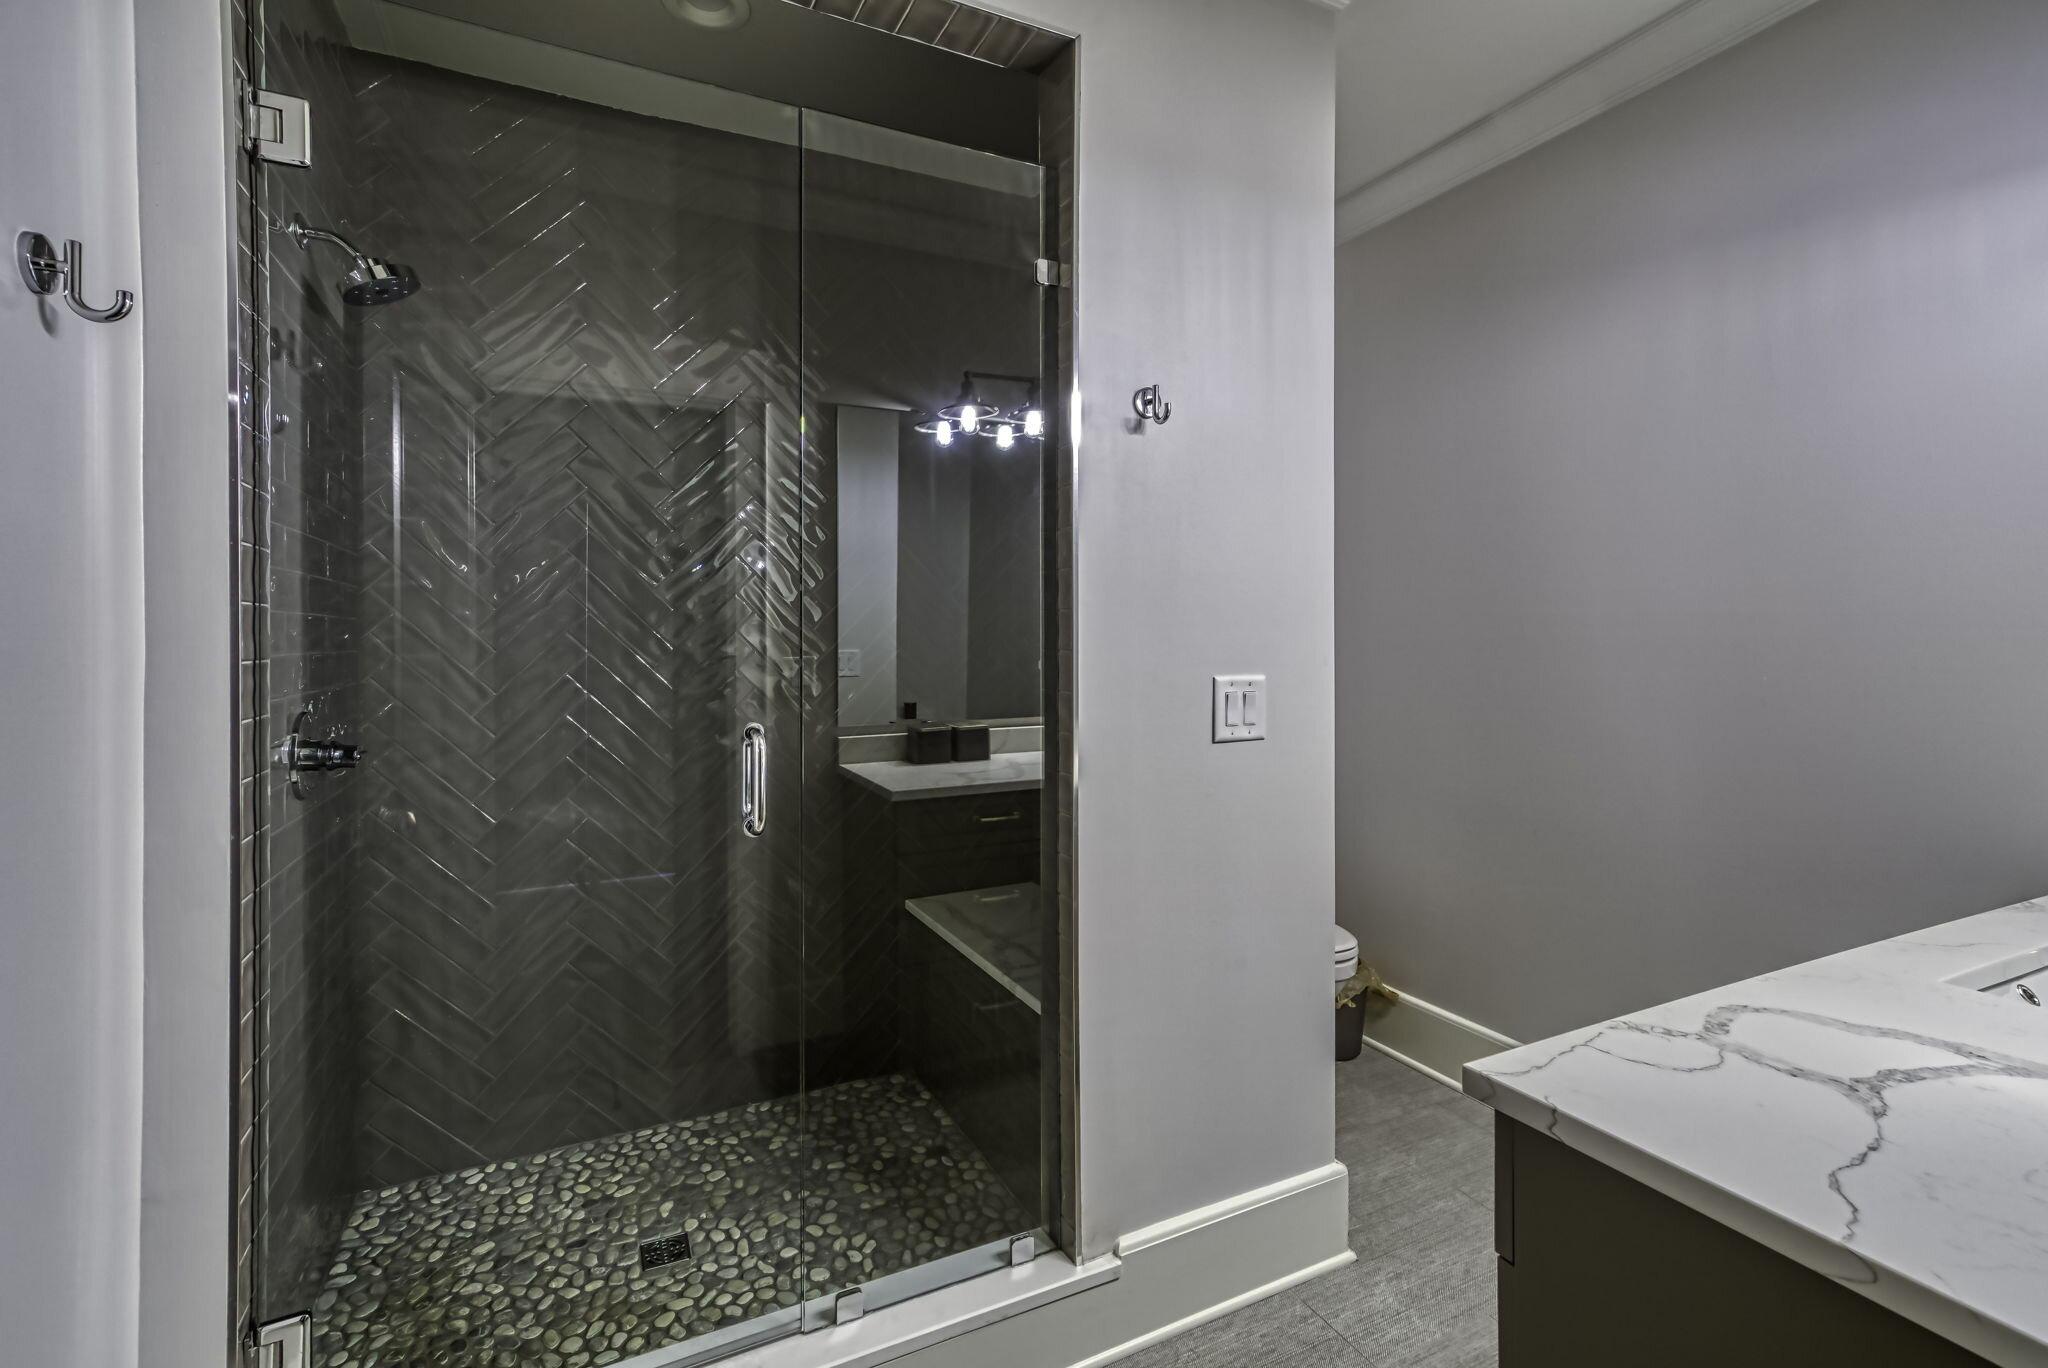 39-web-or-mls-4900 Carmel Park Dr Bedroom 5 Bath 2.jpg